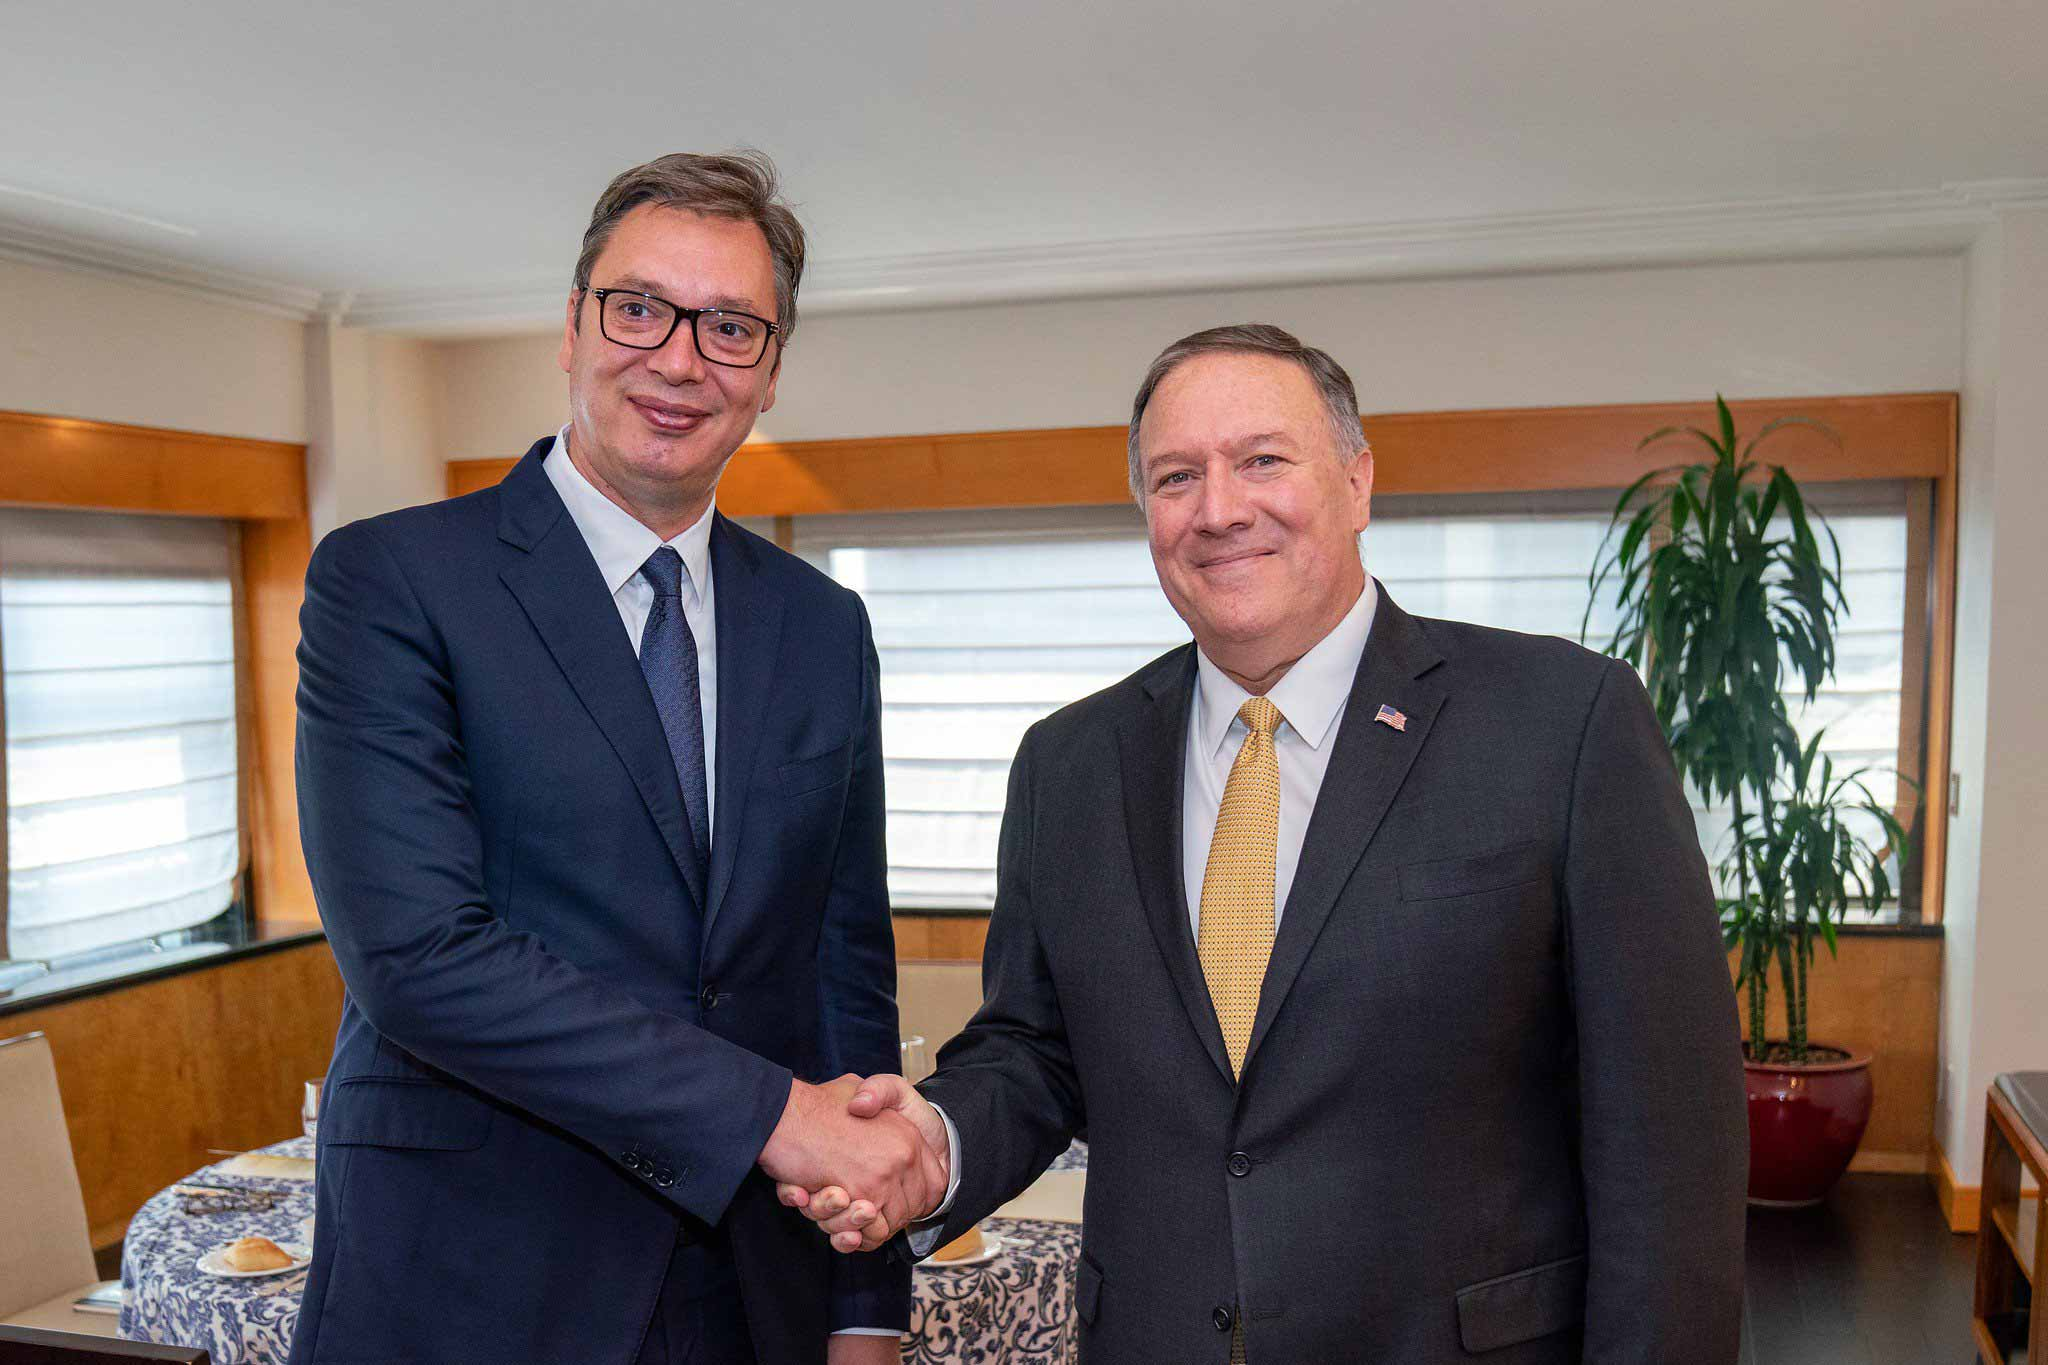 Serbia: Pompeo praises Vučić for branding Hezbollah a terrorist organization